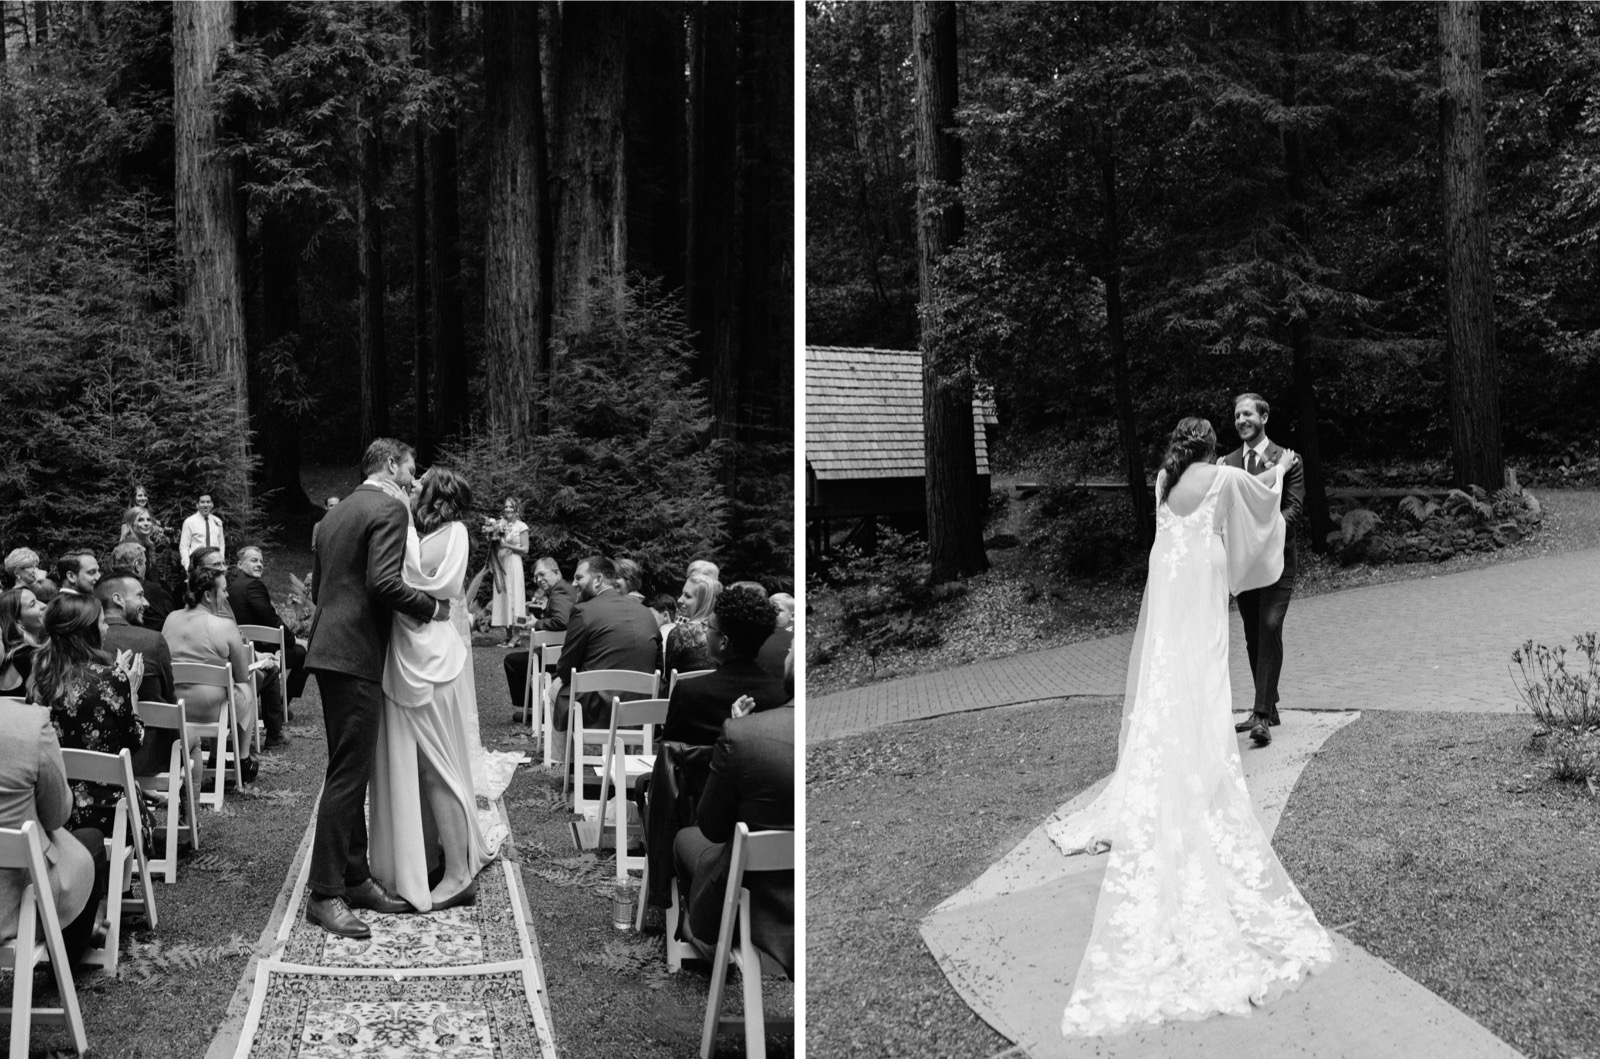 082_Emily & Jeff Wedding 0755_E&J 04131_the-waterfall-lodge_forest_wedding_ben-lomond_intimate